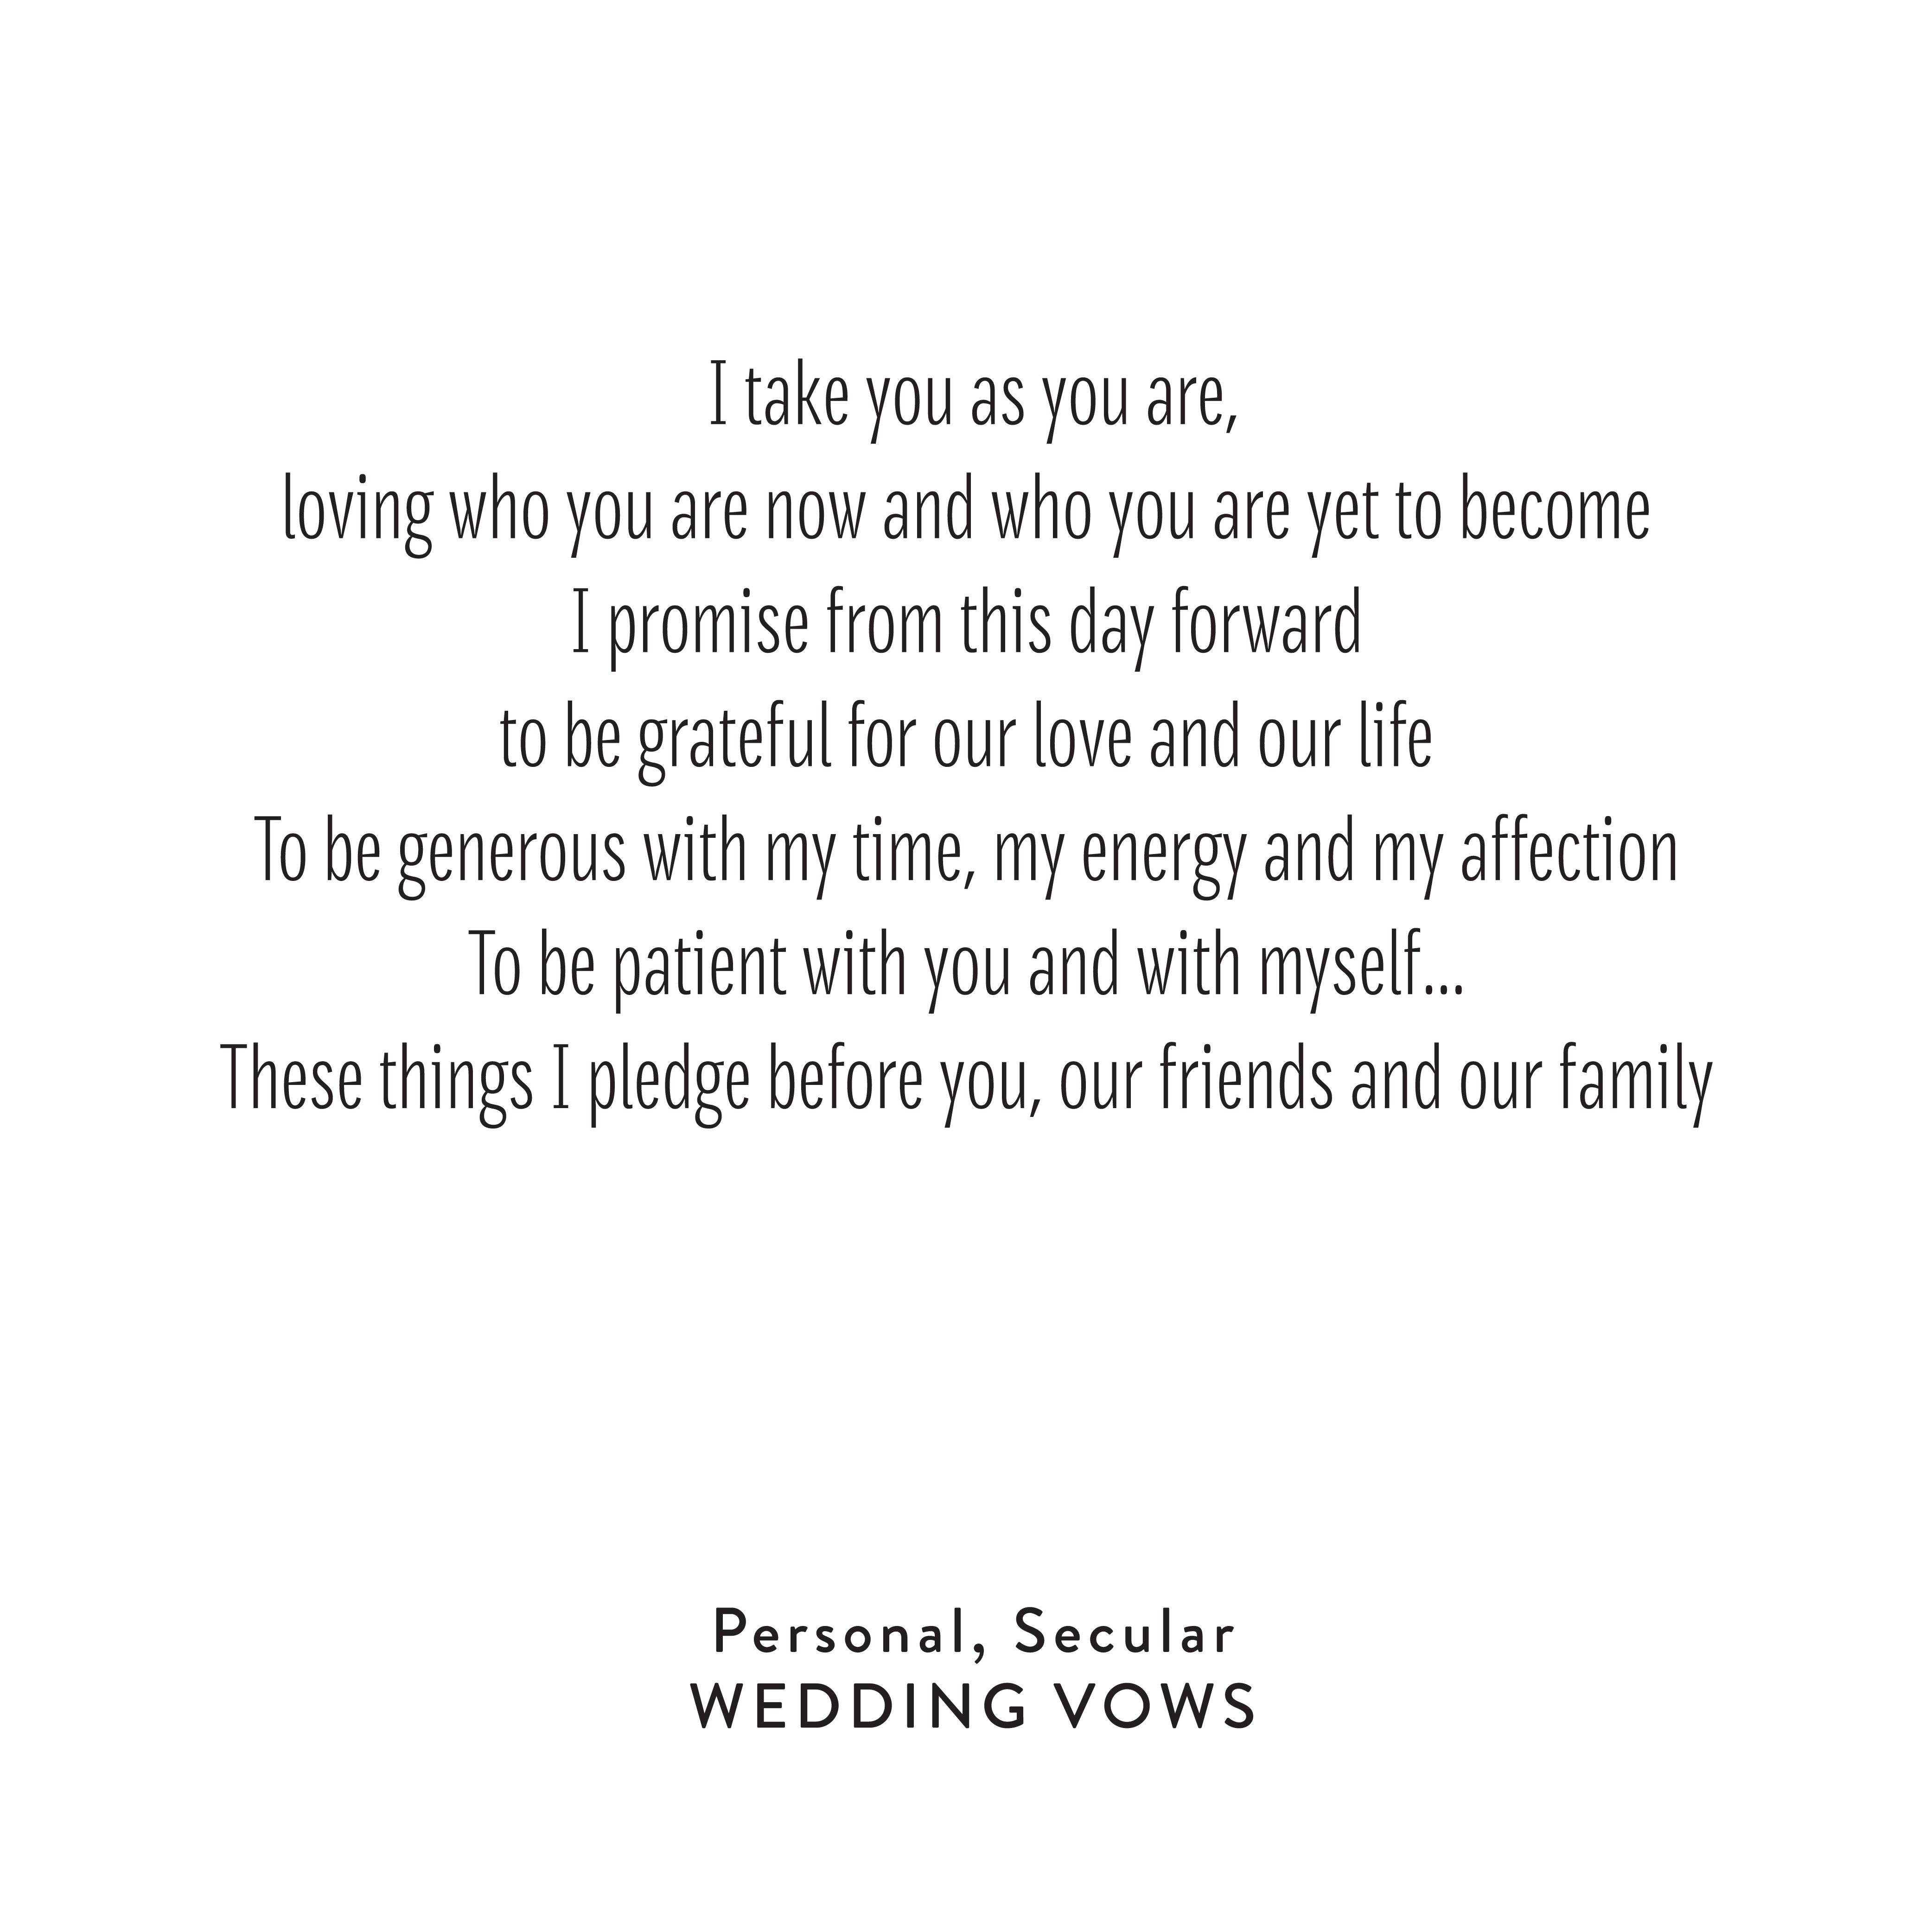 How To Become A Non Religious Wedding Officiant | Wedding Vows Personal Secular Wedding Bells Wedding Wedding